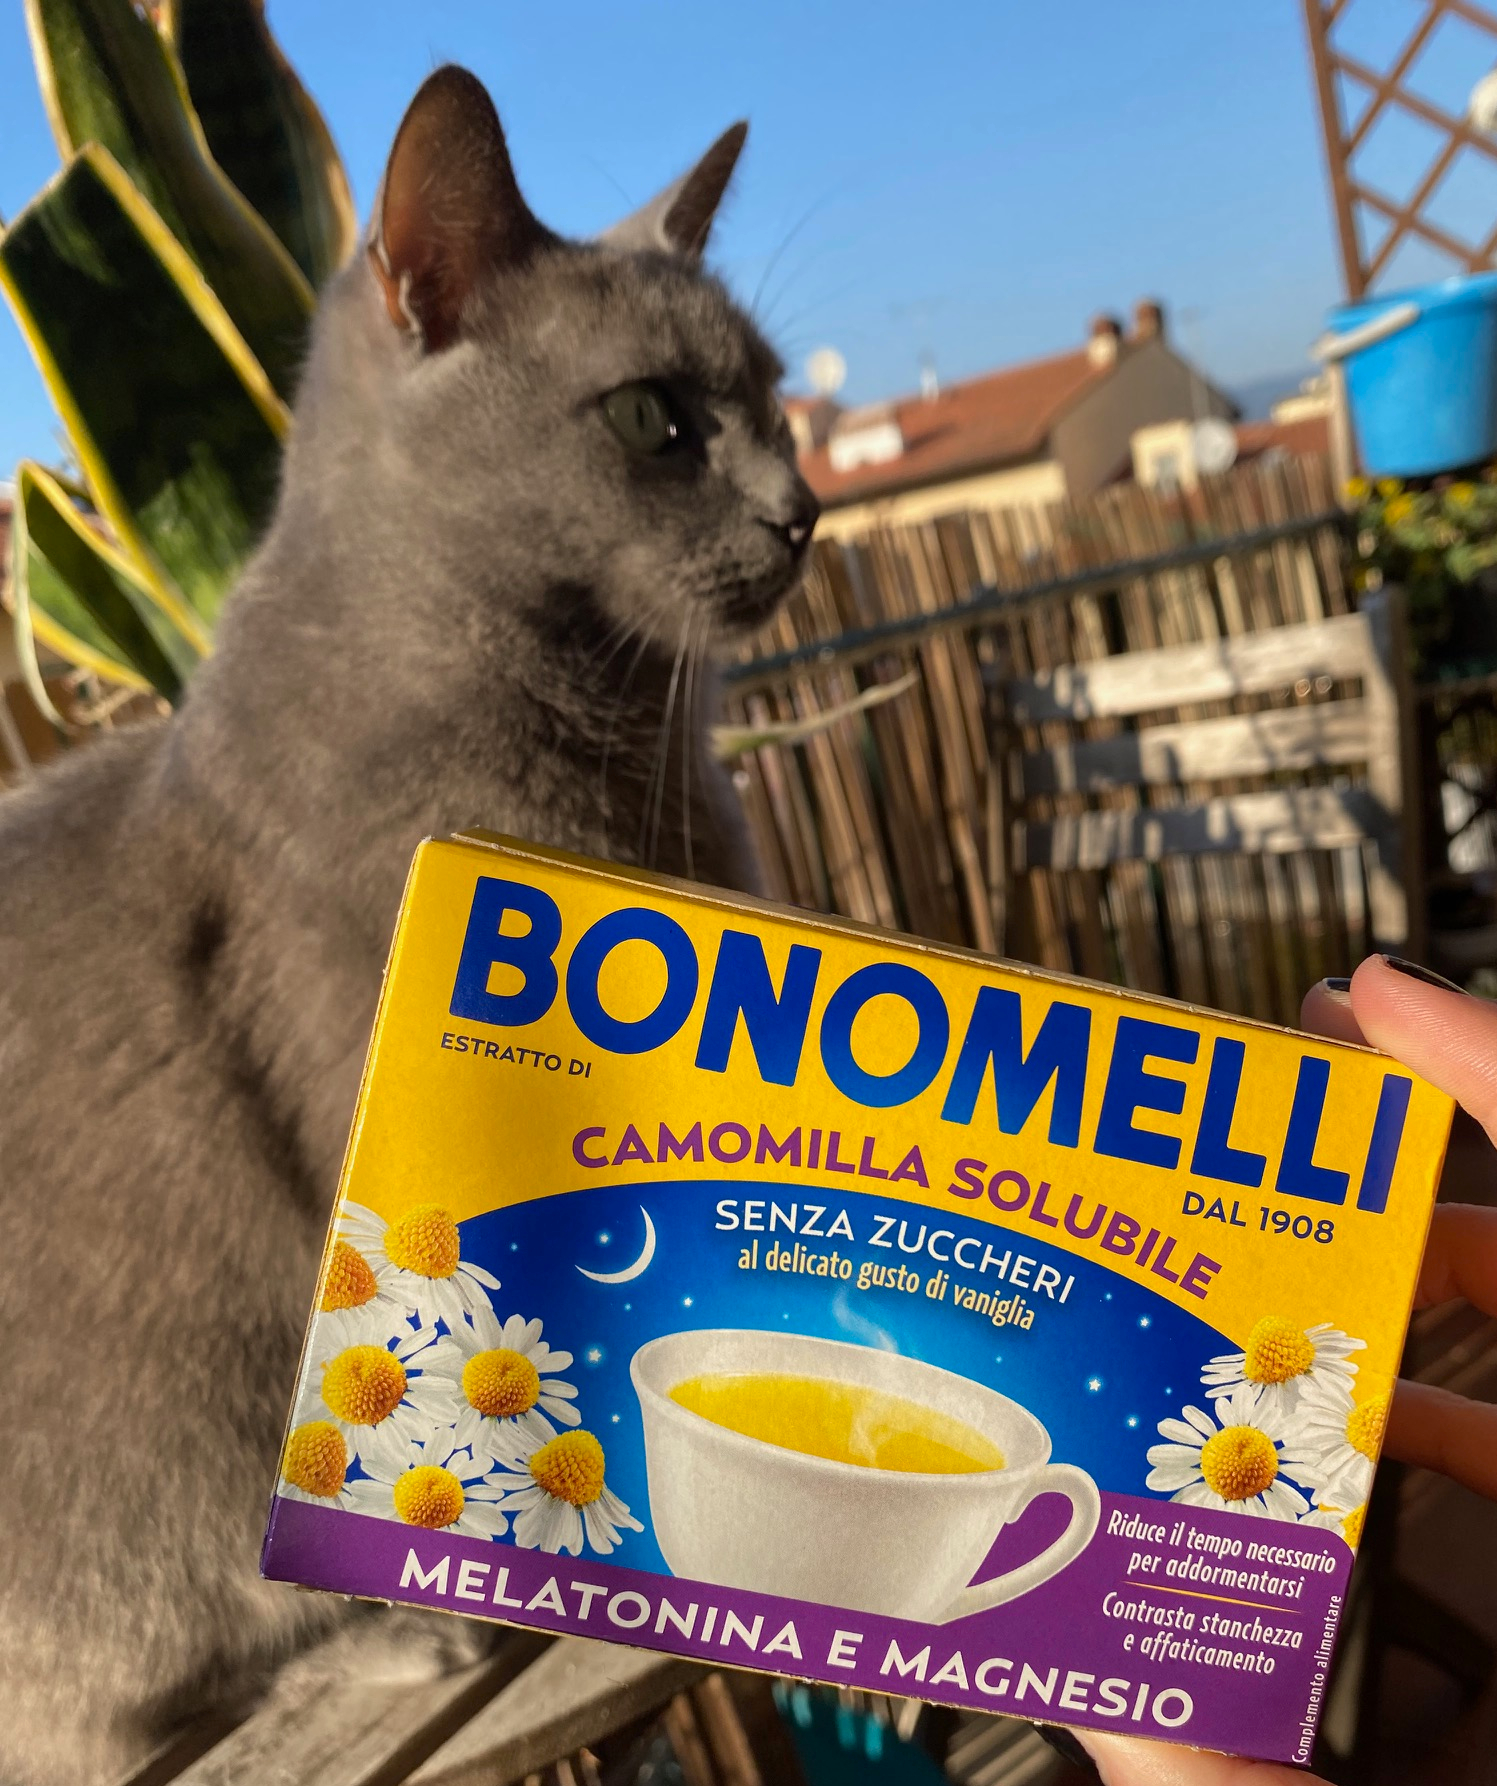 bonomelli-melatonina